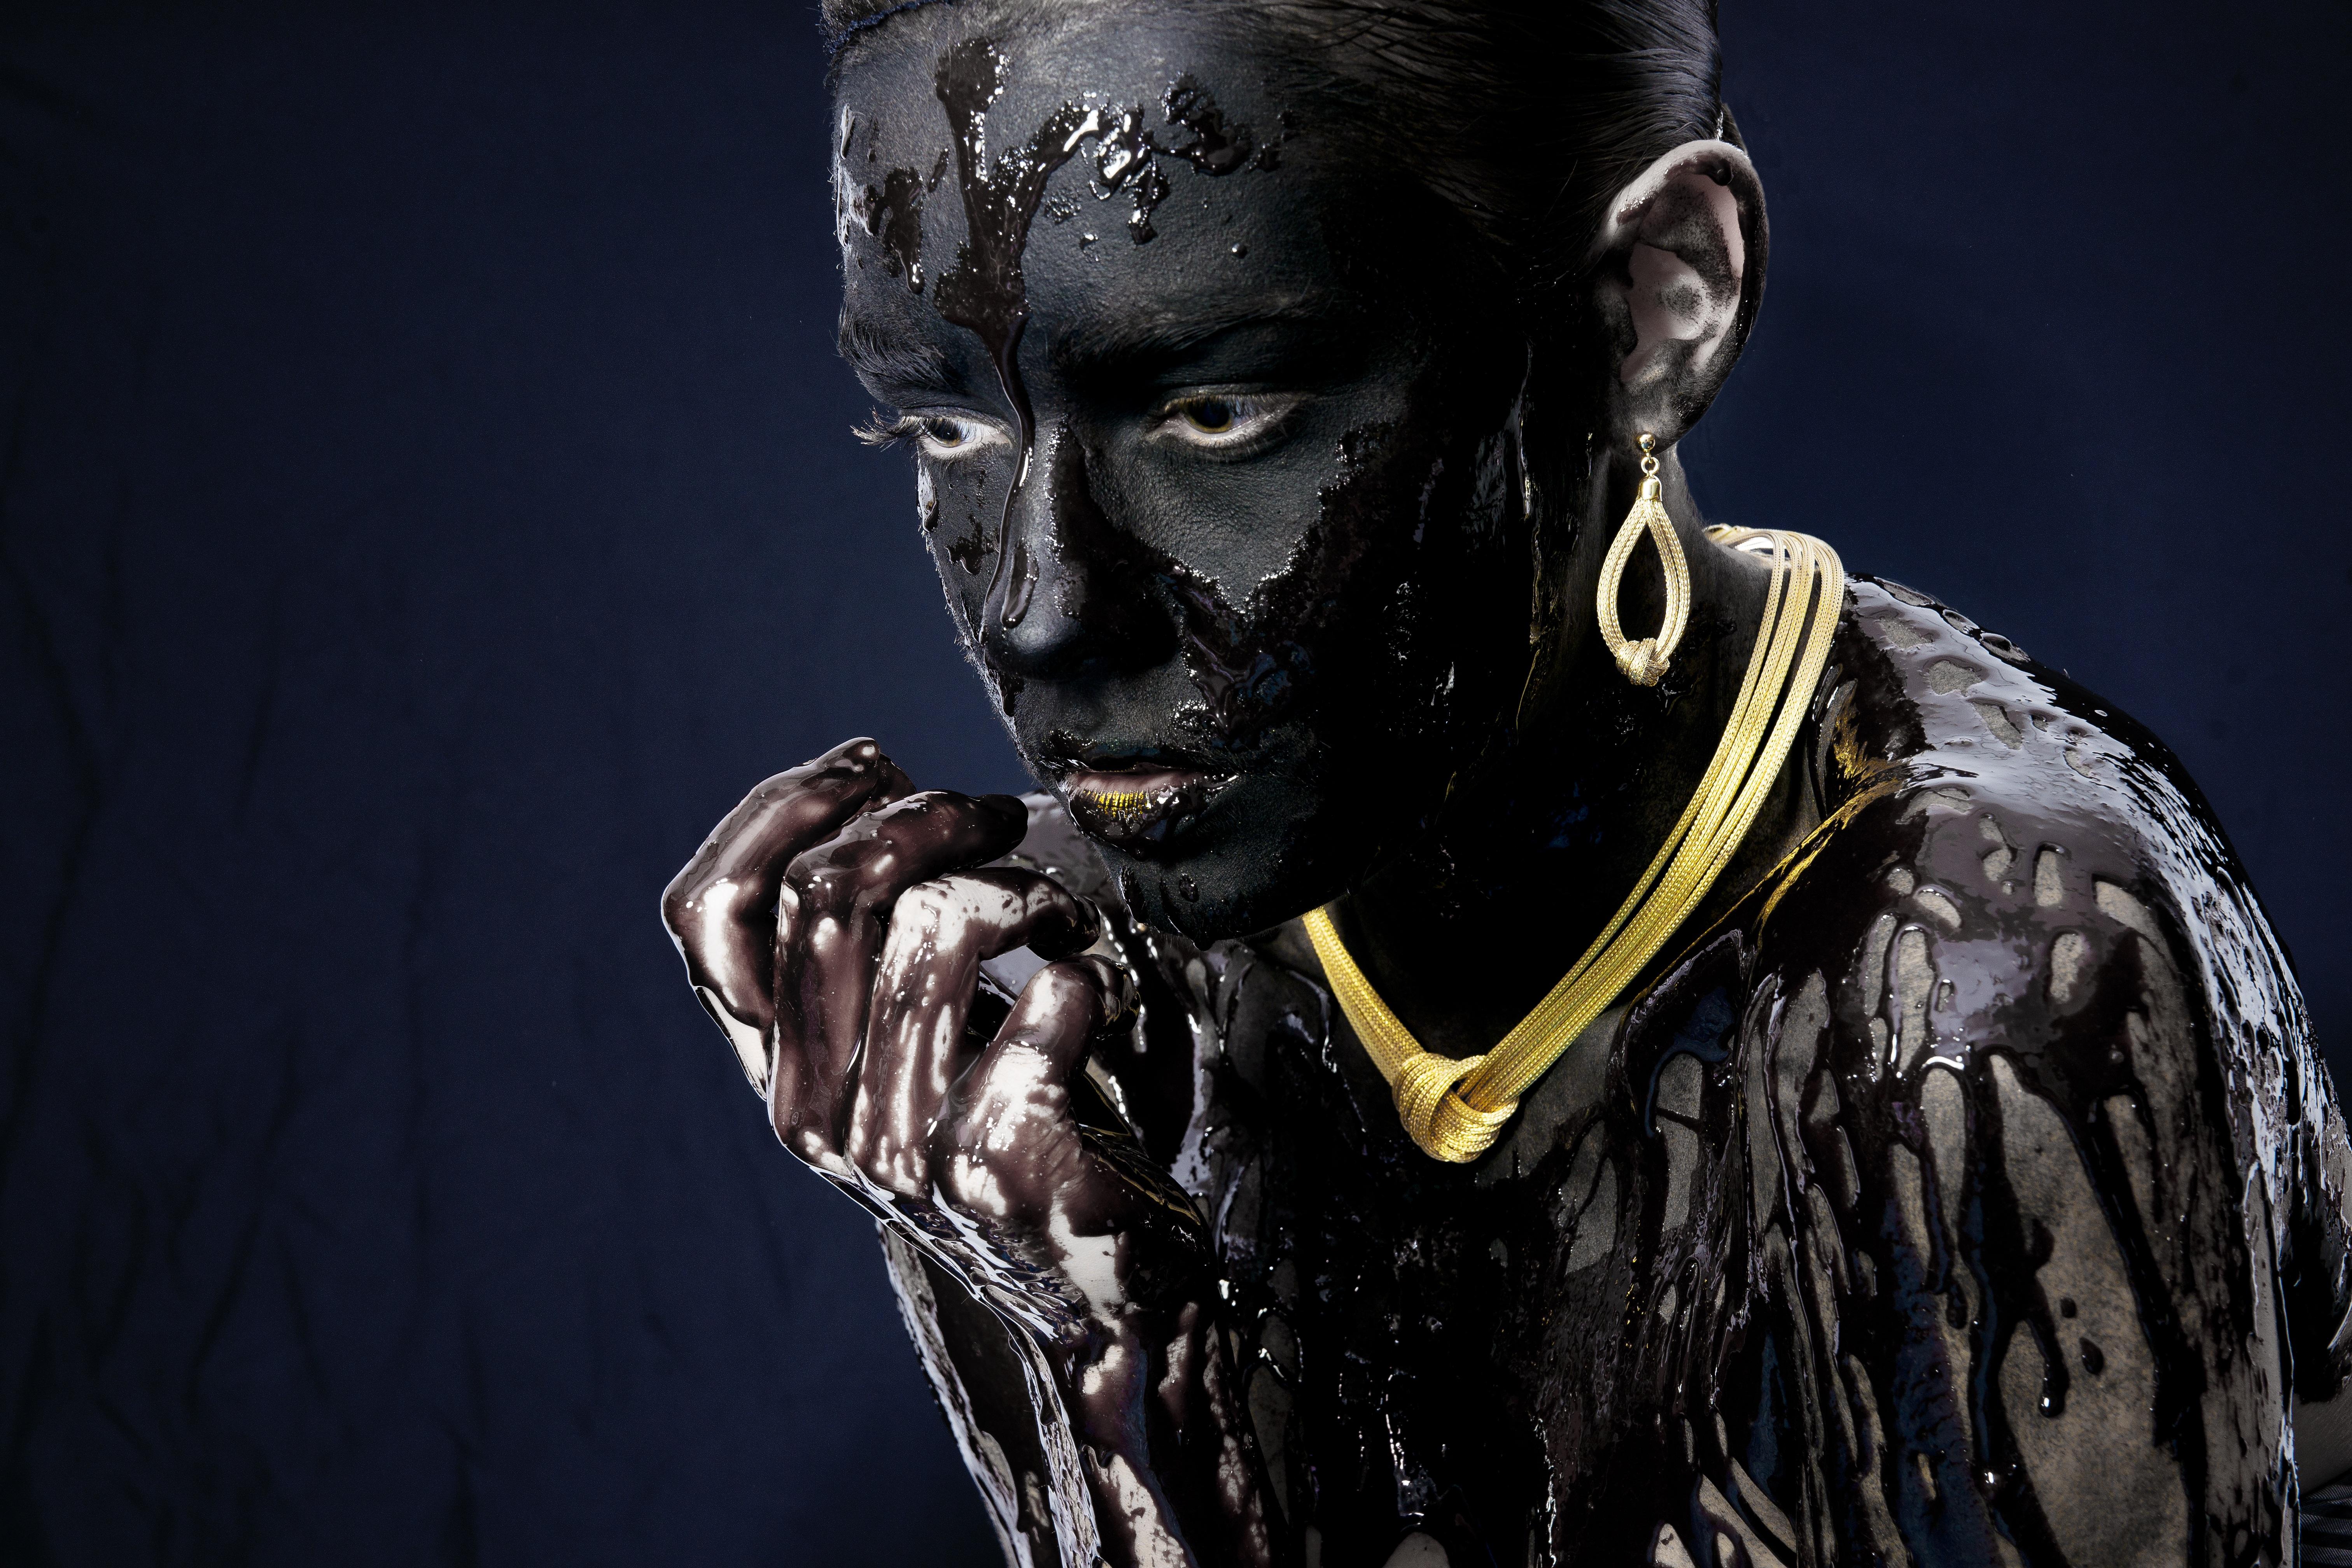 Fotoğraf Insanlar Karanlık Heykel Portre Model Stüdyo Insan